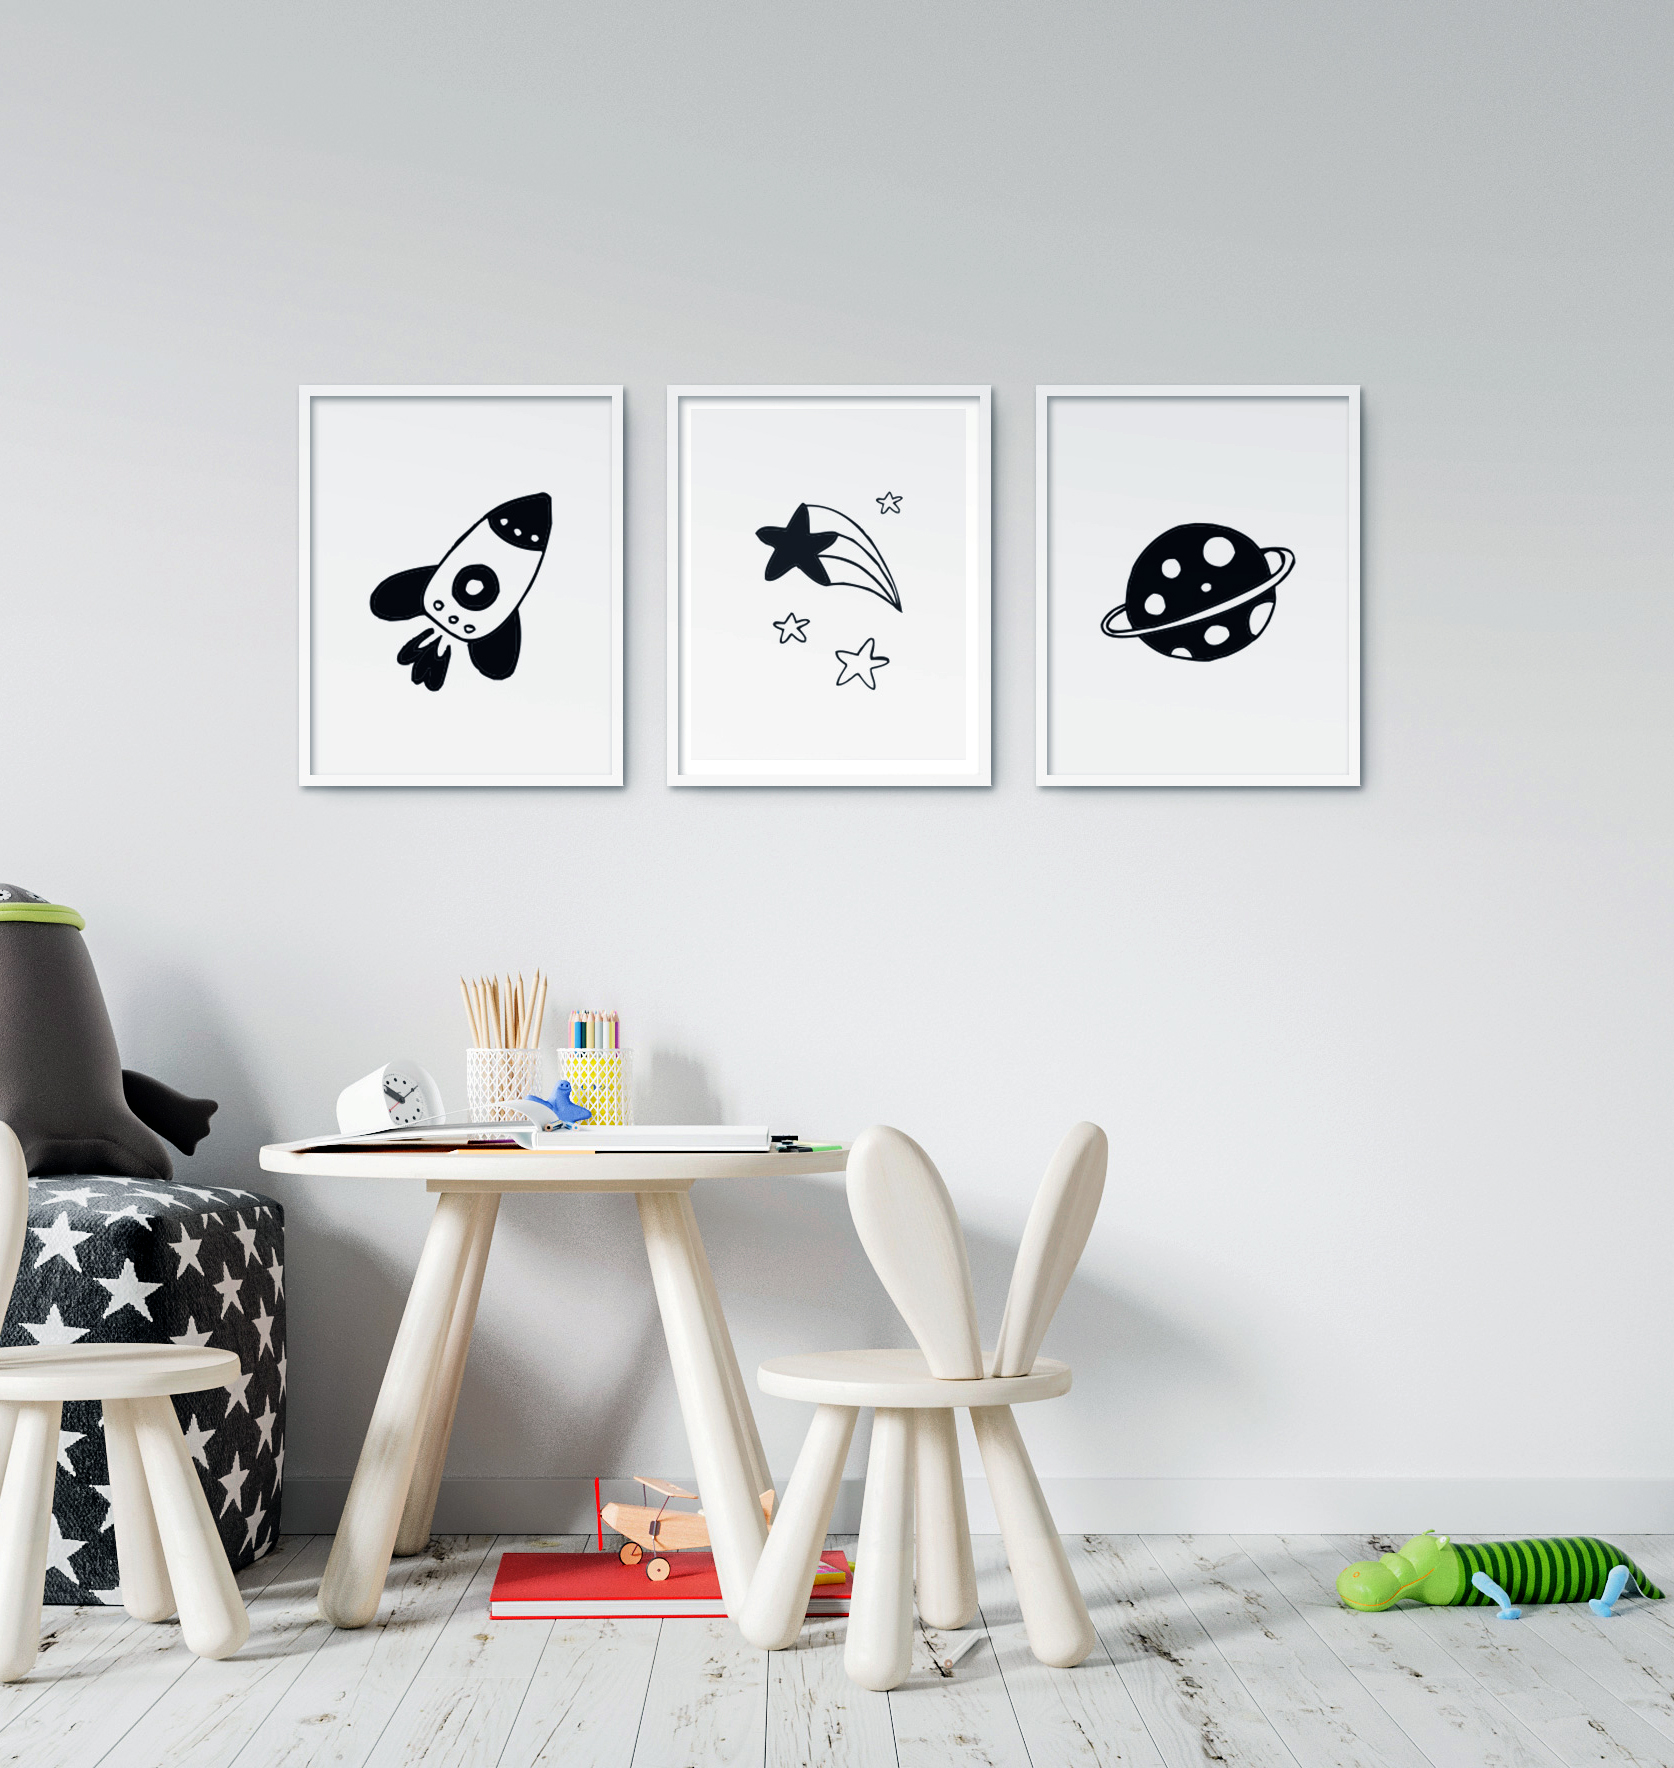 space-posters-8x10.jpg